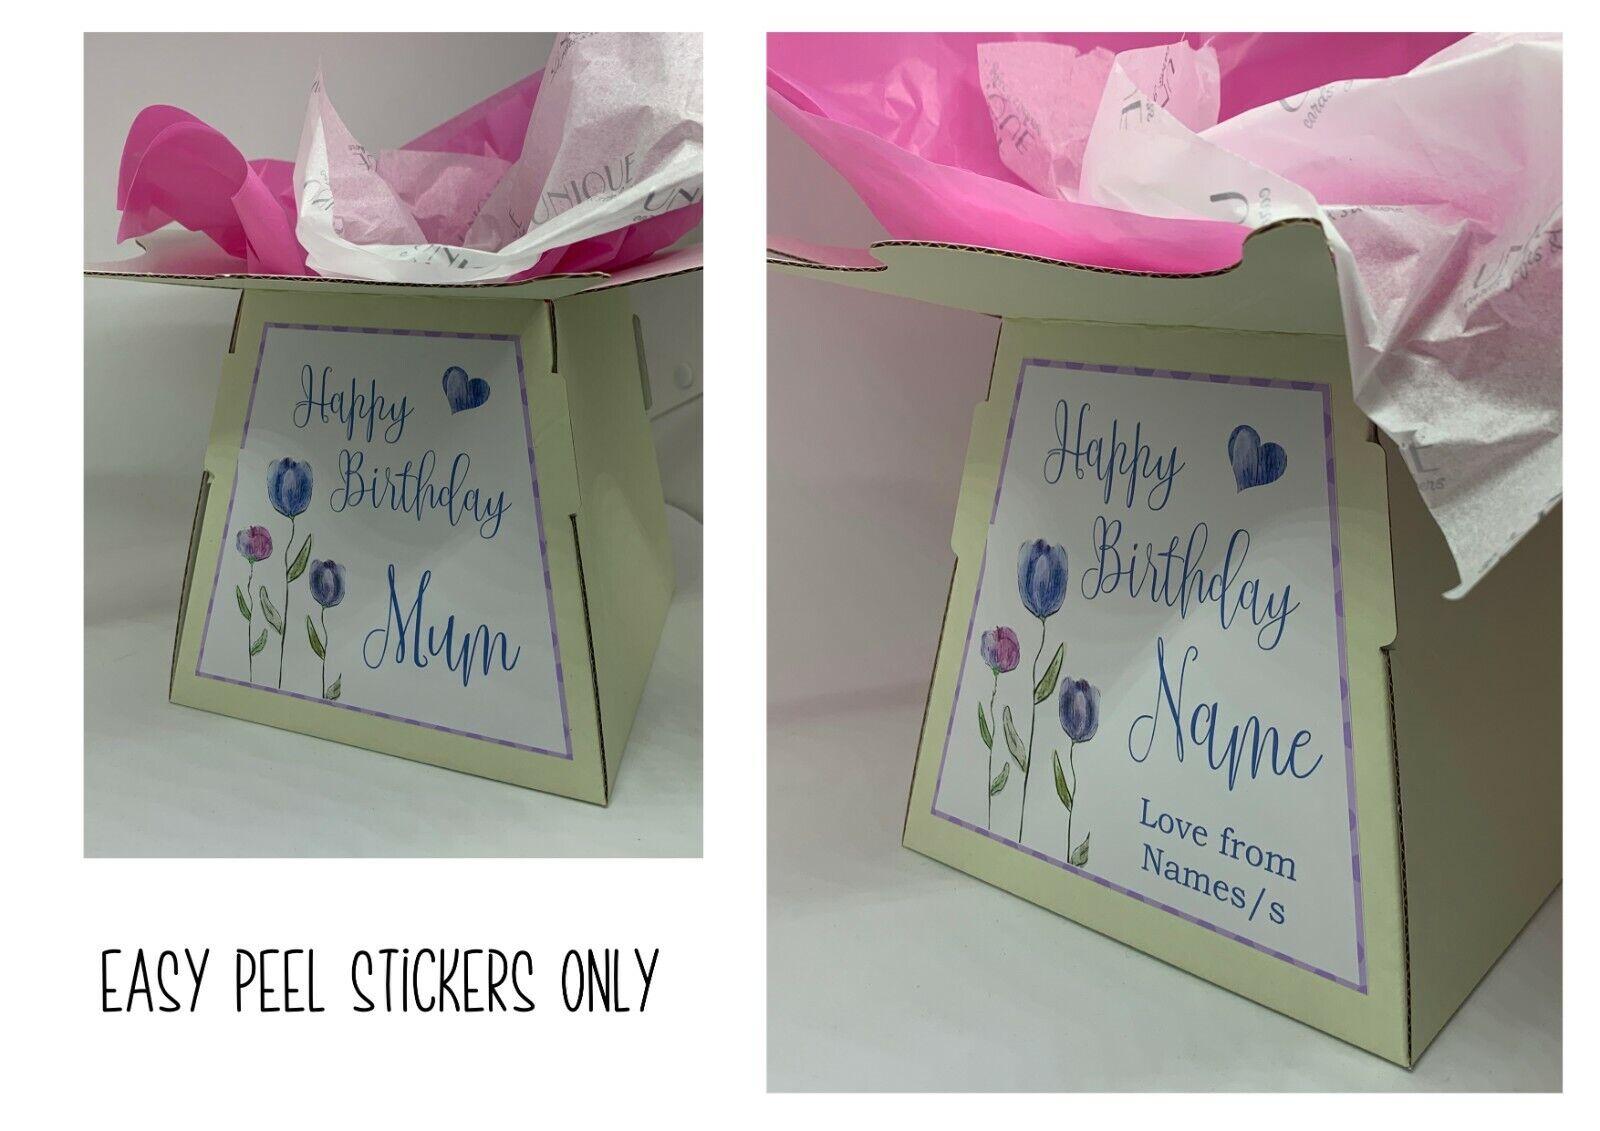 Etiqueta engomada de la caja de regalo   Caja De Flores Ramo de caja de la etiqueta engomada de la etiqueta engomada     Feliz Cumpleaños